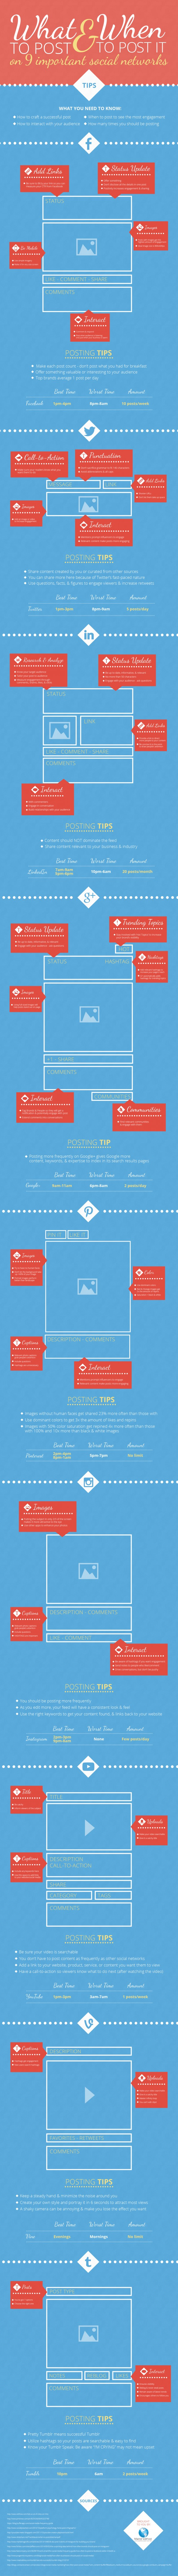 sm-posting-infographic-2.jpg